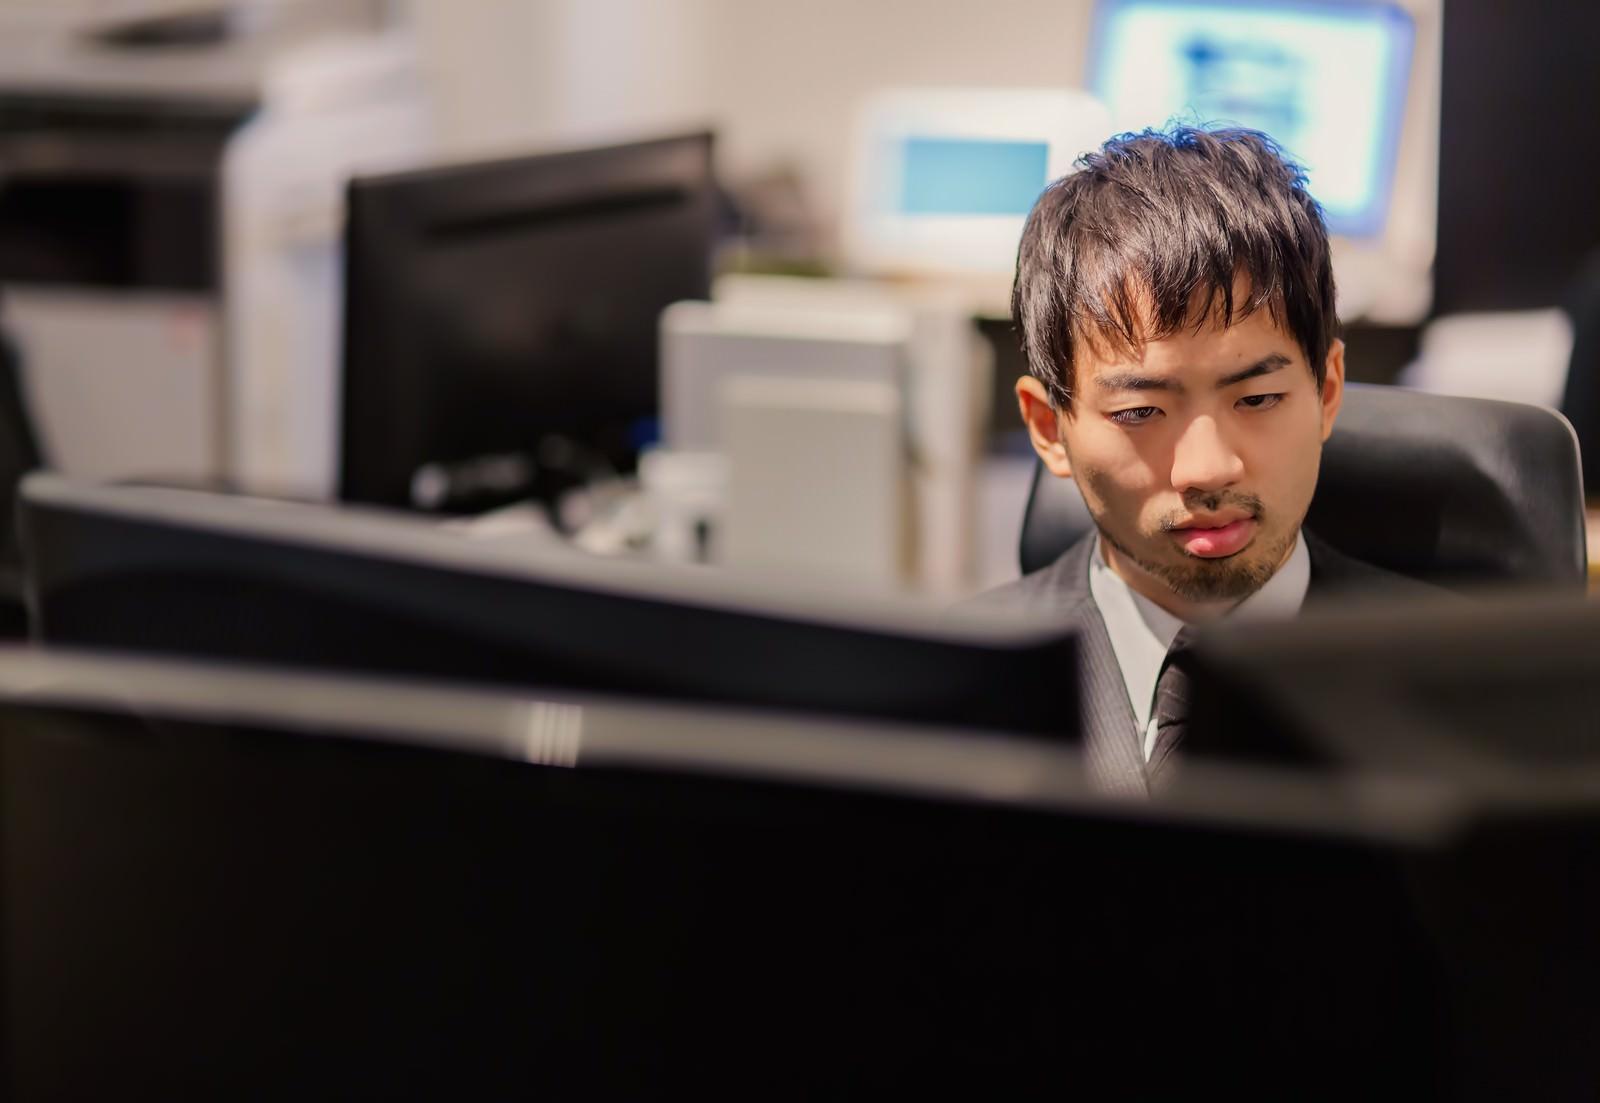 「PCが並ぶオフィスでモニタリングする男性PCが並ぶオフィスでモニタリングする男性」[モデル:ひろゆき]のフリー写真素材を拡大